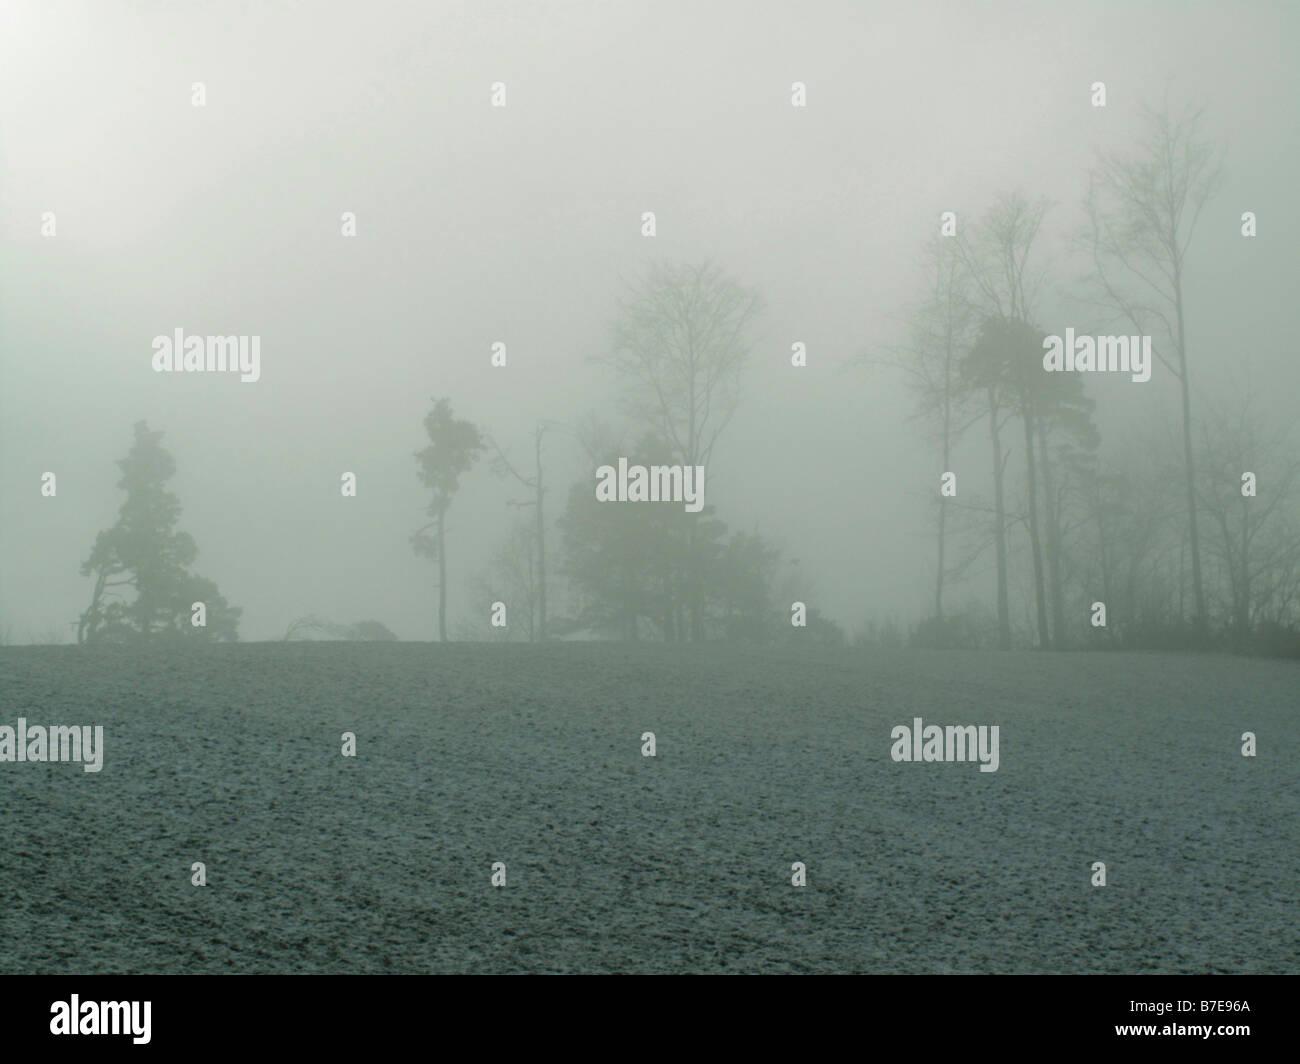 foggy trees canton of zurich switzerland - Stock Image